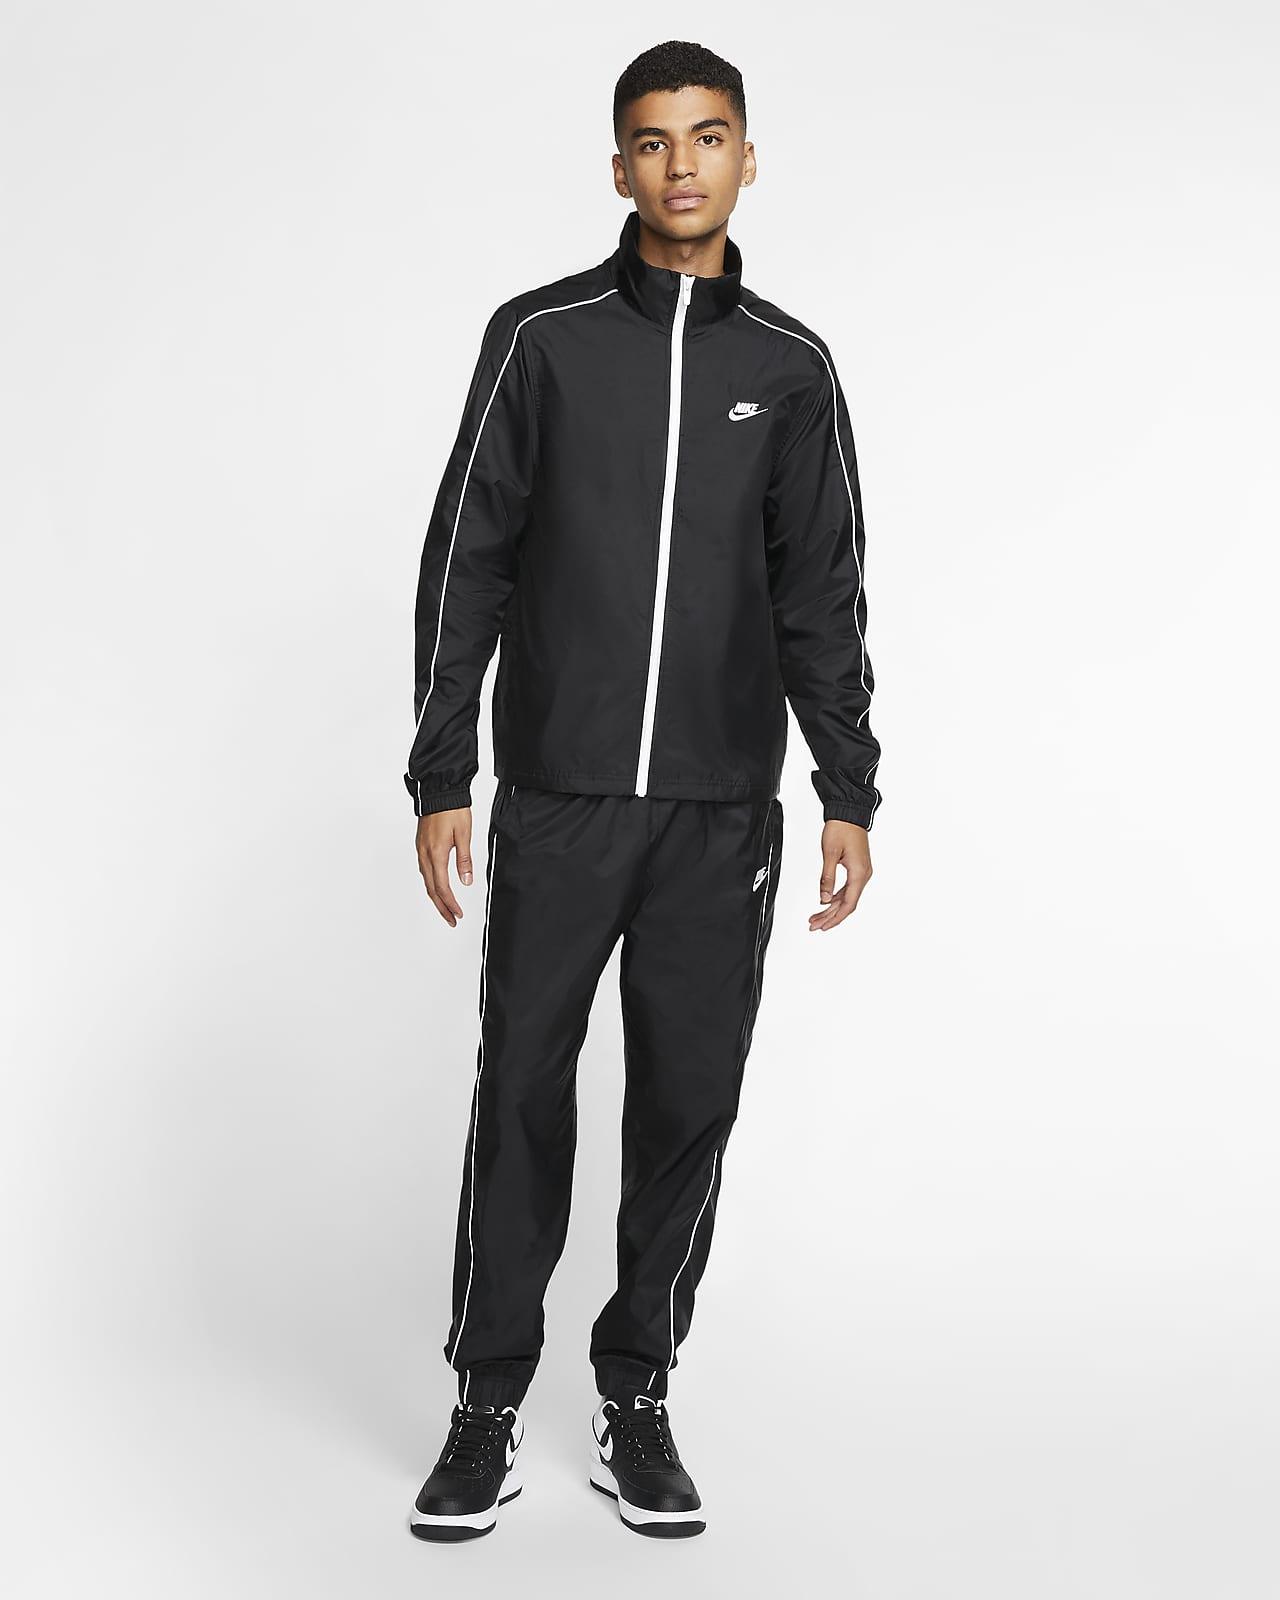 Nike NSW TRACK SUIT WOVEN Trainingsanzug Herren